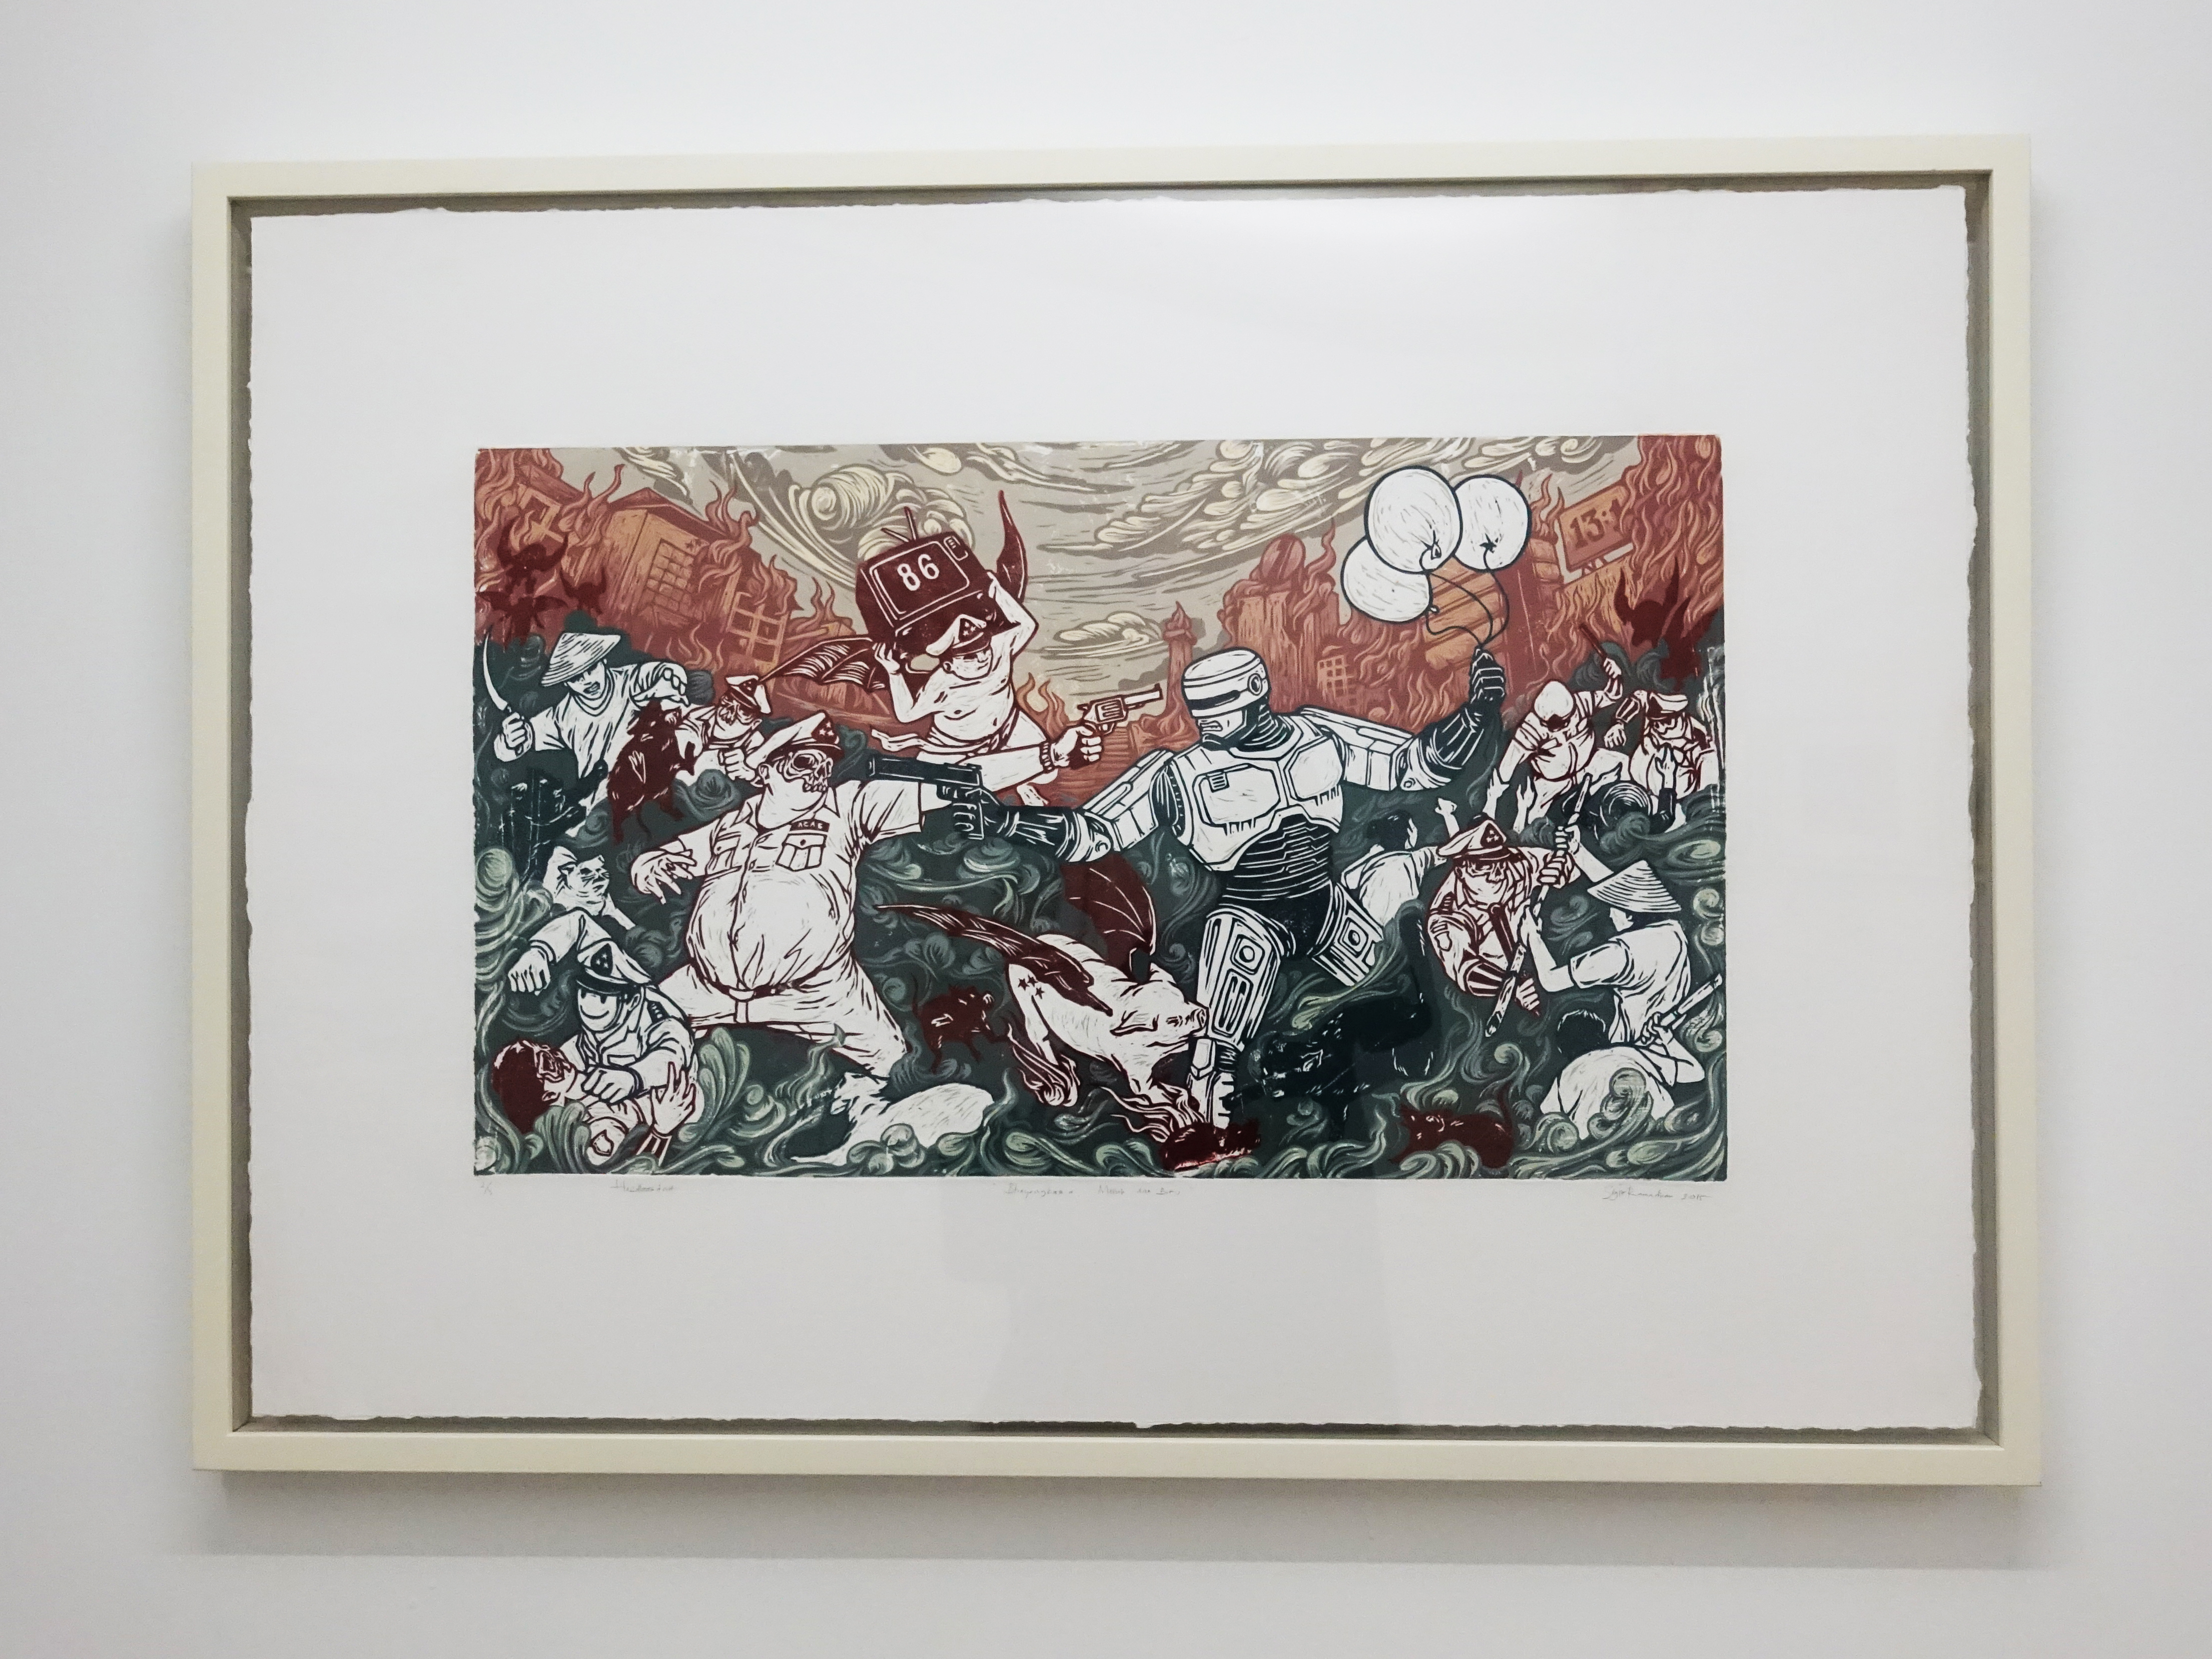 Sigit Ramadhan,《Bhayangkara Merah dan Biru》,69 x 98 cm,Reduction hardboardcut print on paper2/3,2015。